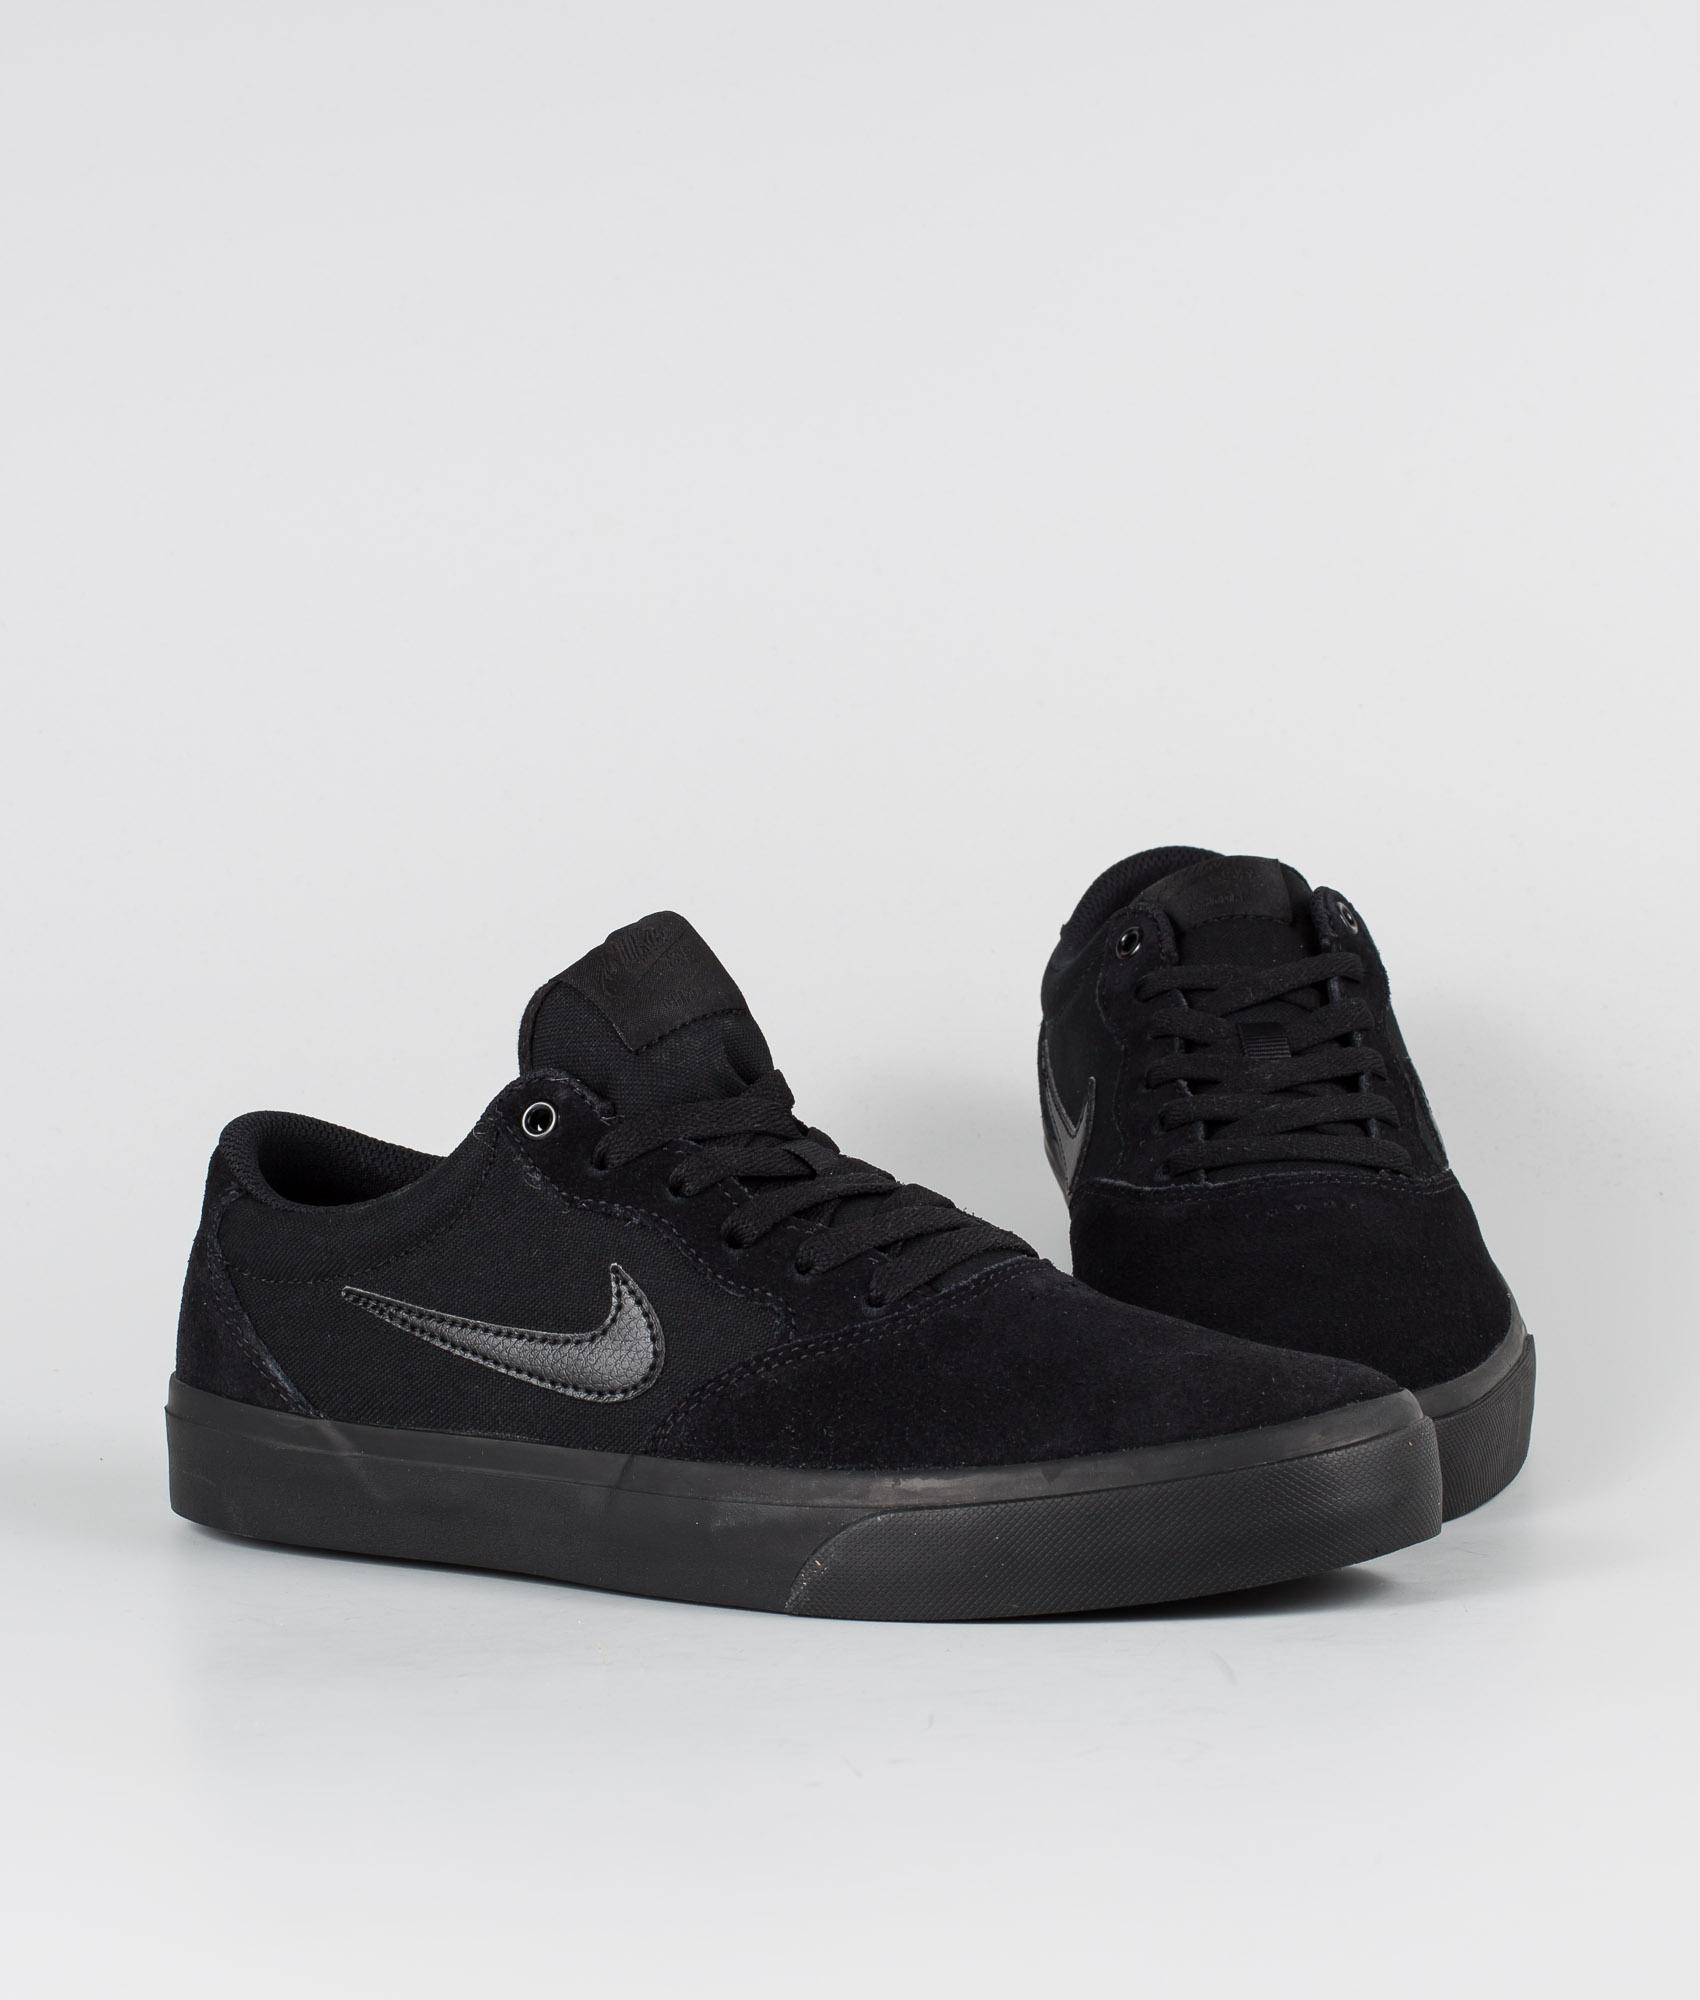 Nike SB Chron SLR Chaussures BlackBlack Black Black